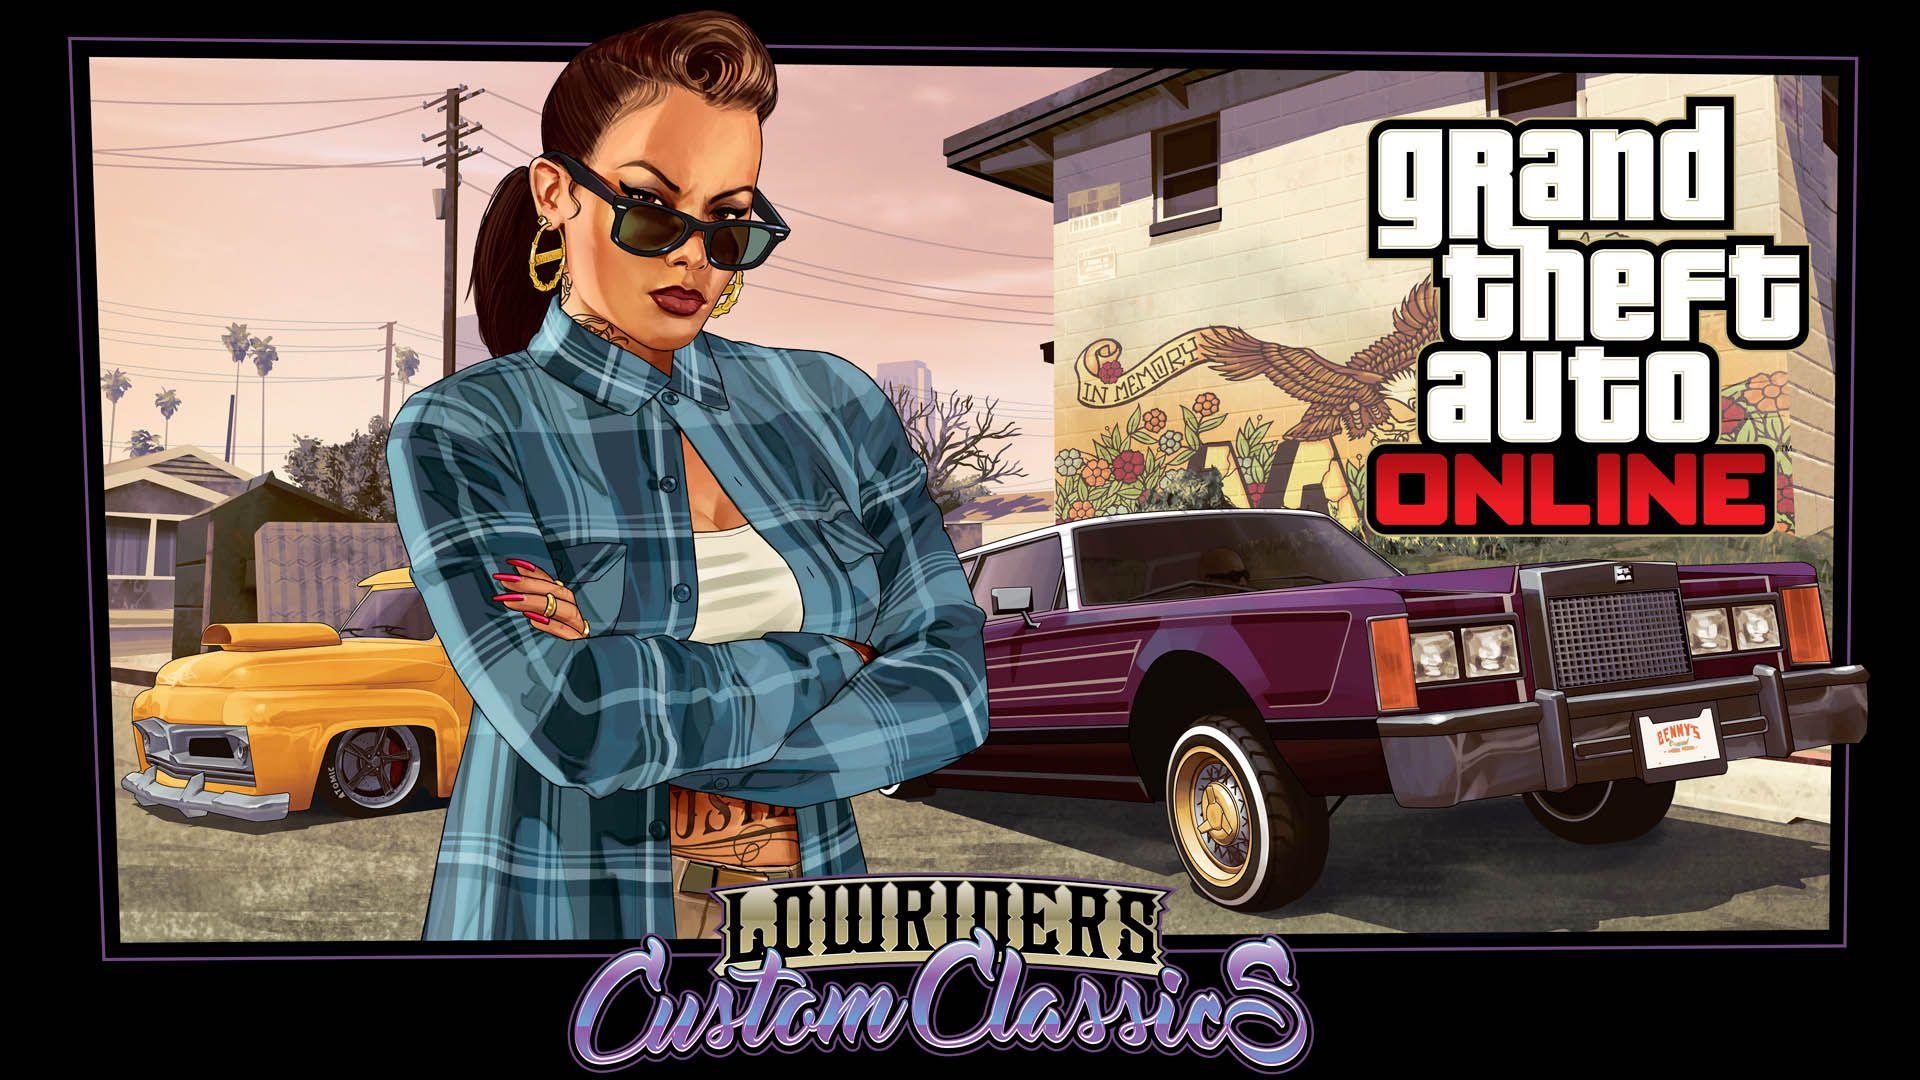 Lowriders Custom Classics GTA 5 Online Update 1920x1080